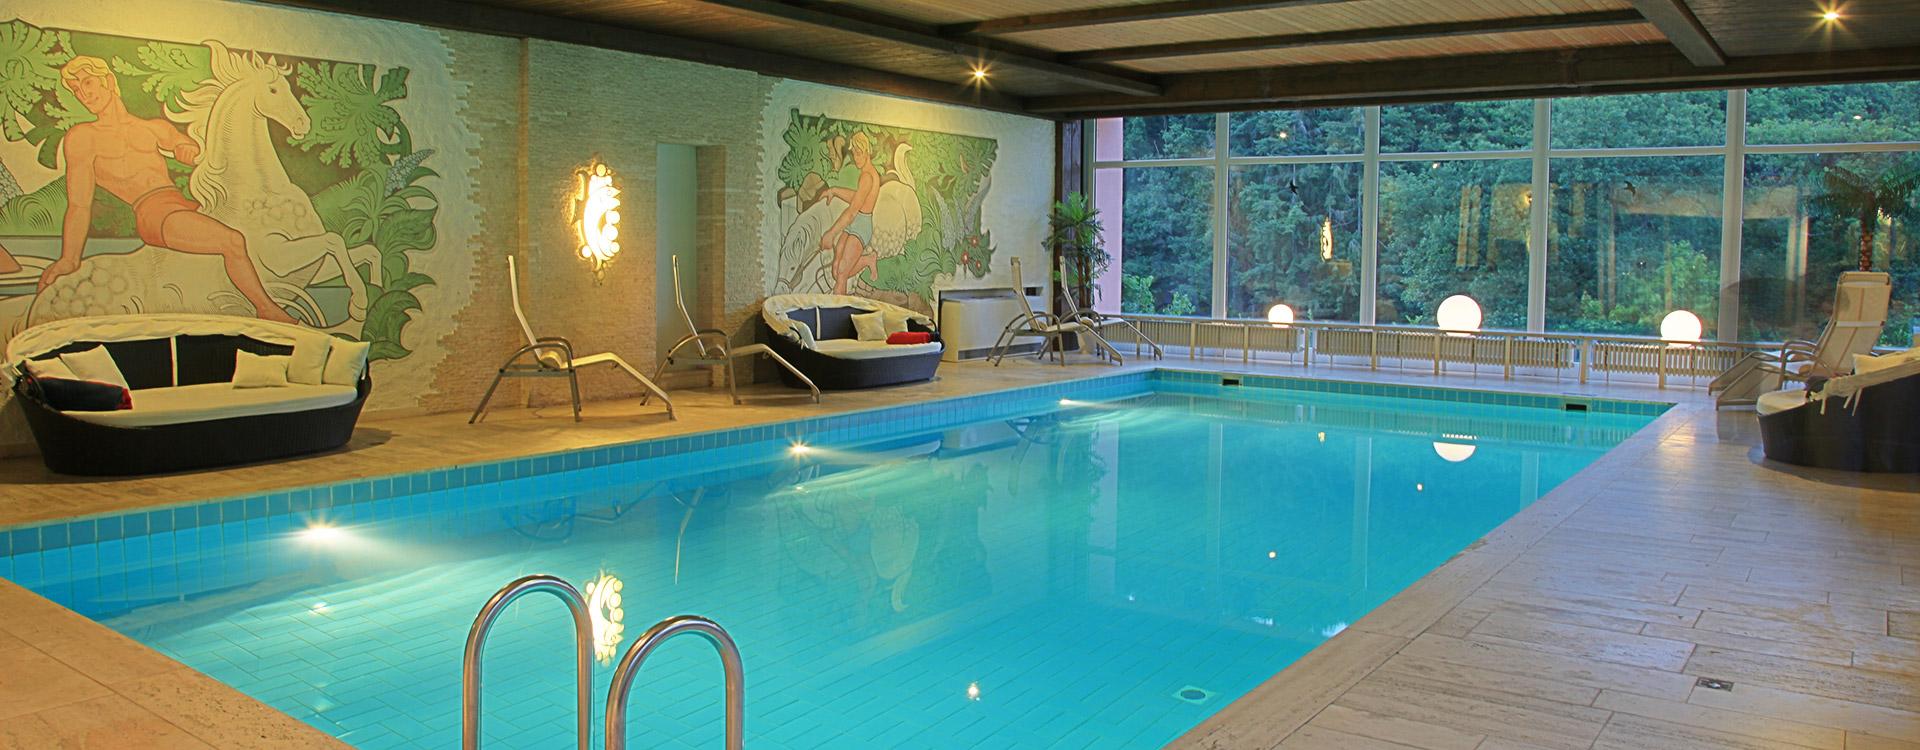 akzent_waldhotel_rheingau_geisenheim_wellness_schwimmbad_02